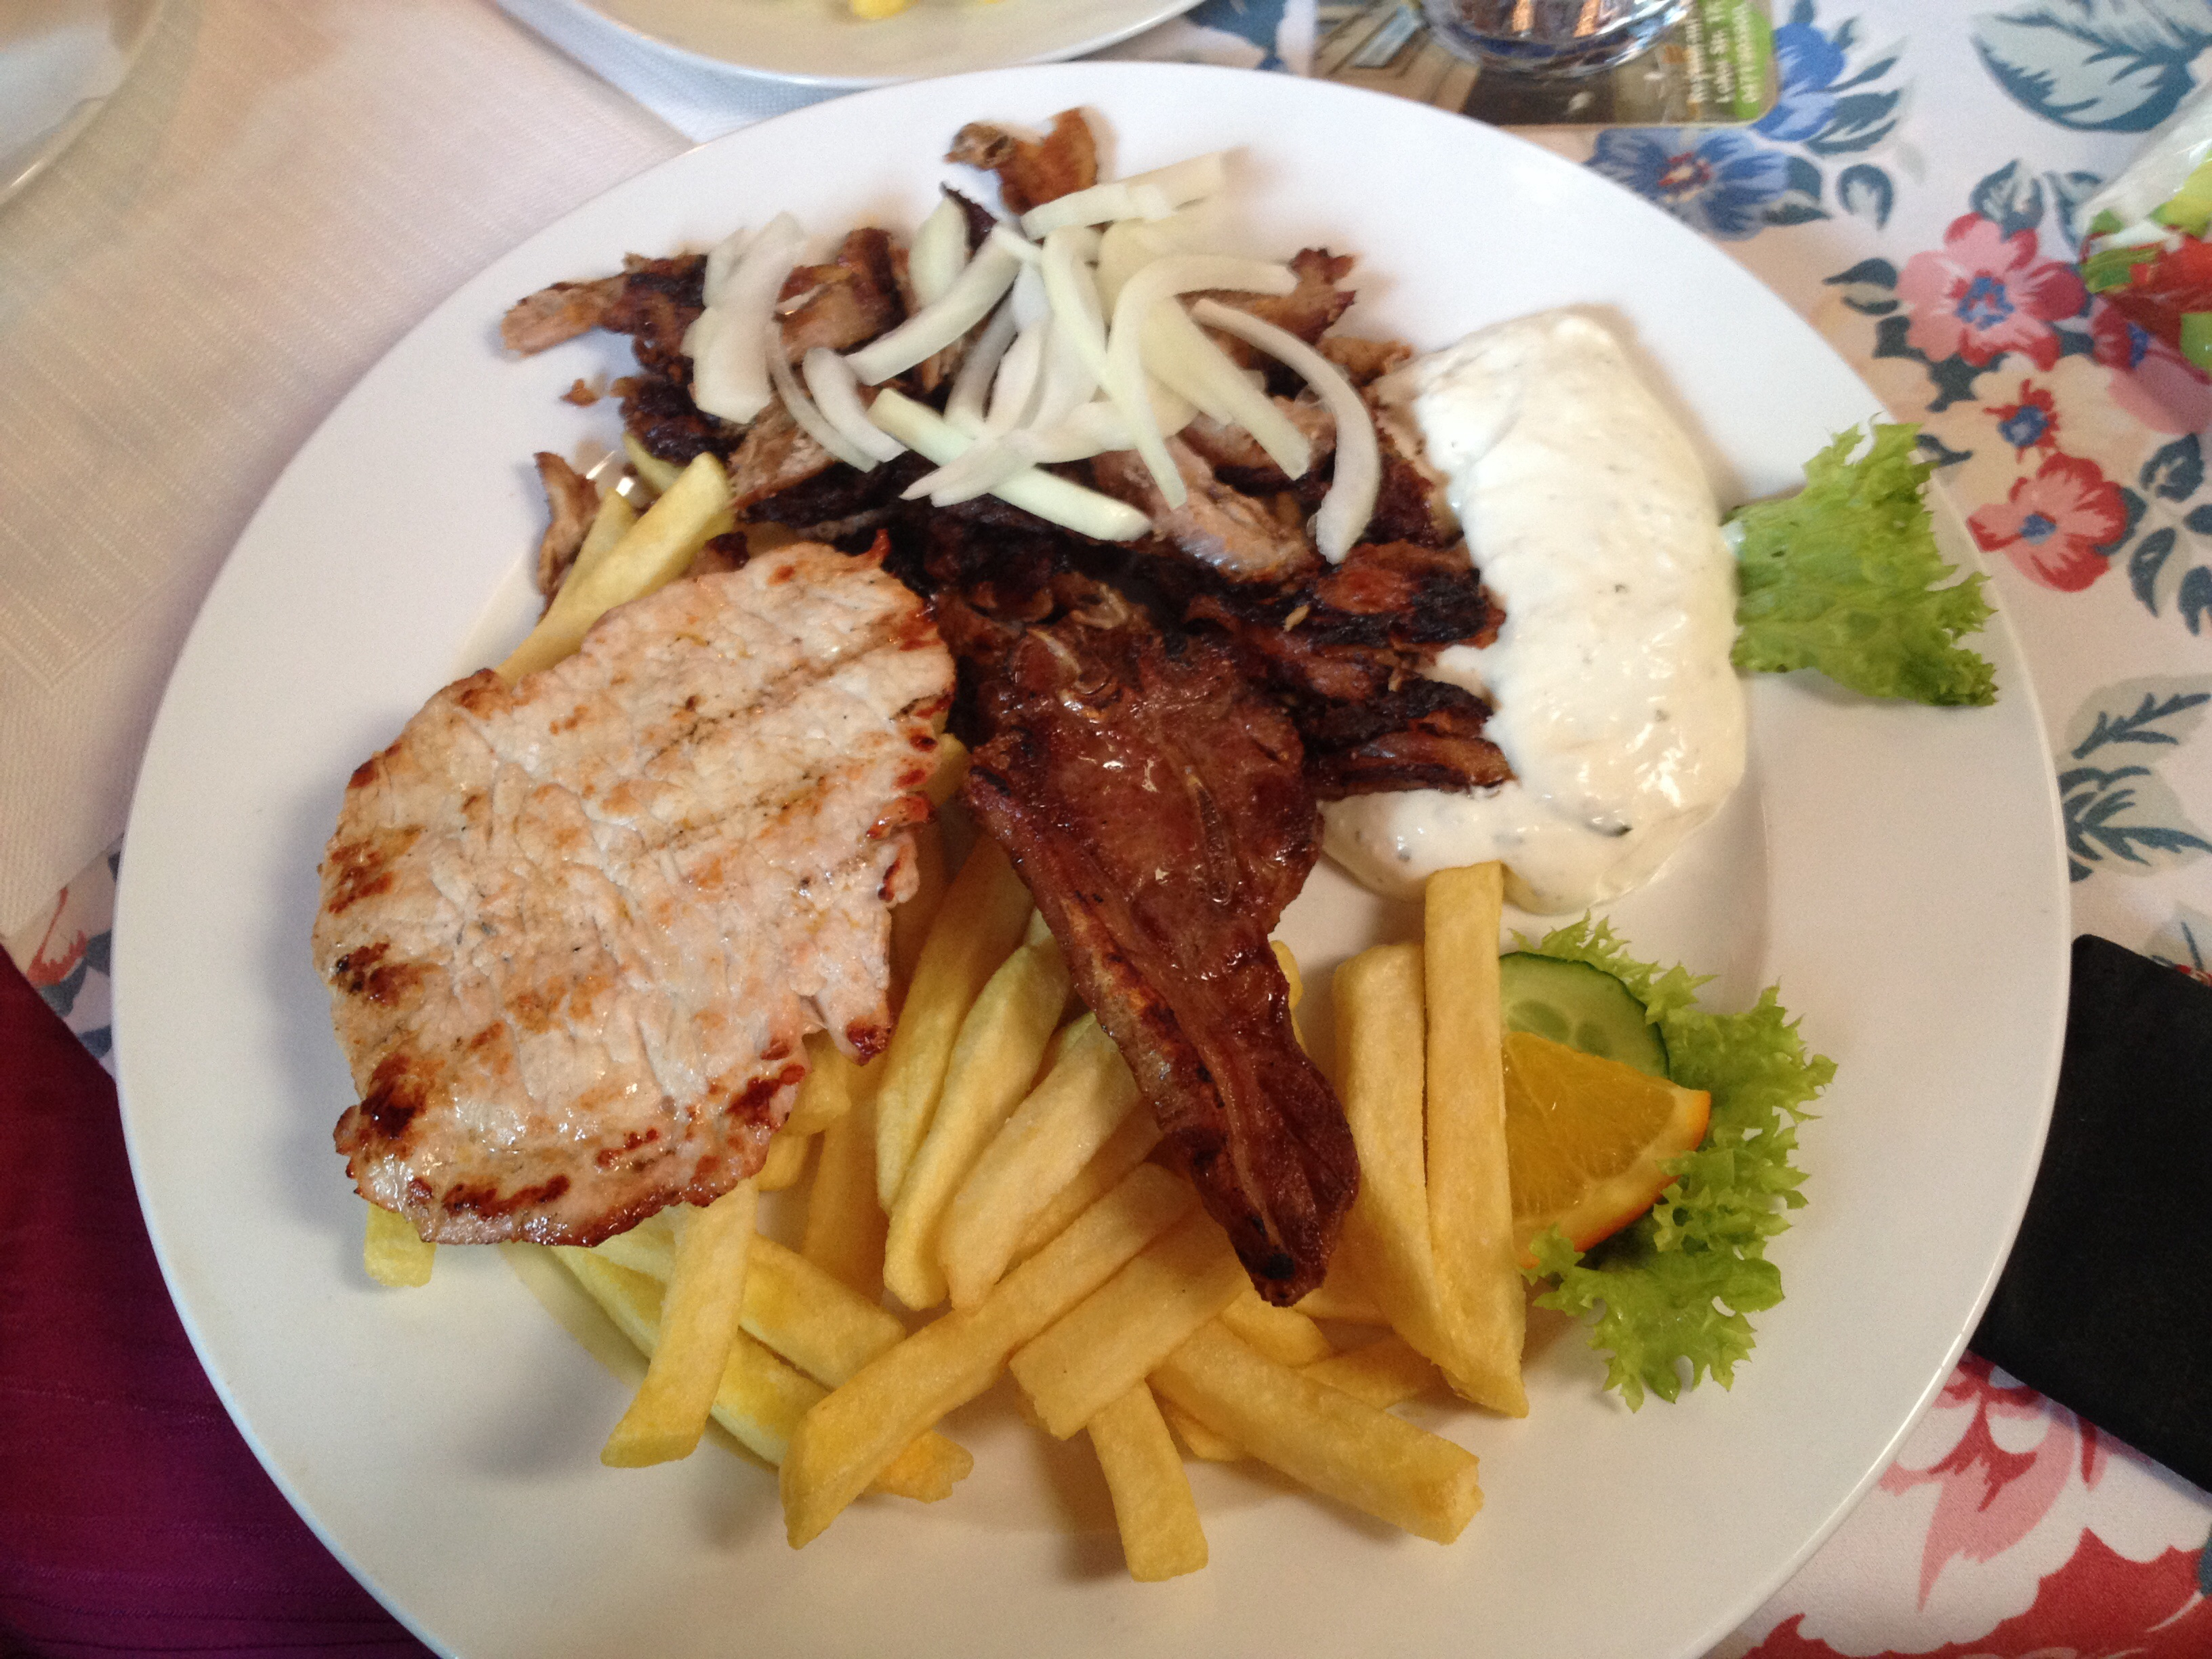 http://foodloader.net/BrollyLSSJ_2014-12-28_Adria_II_-_Korinth_Teller.jpg